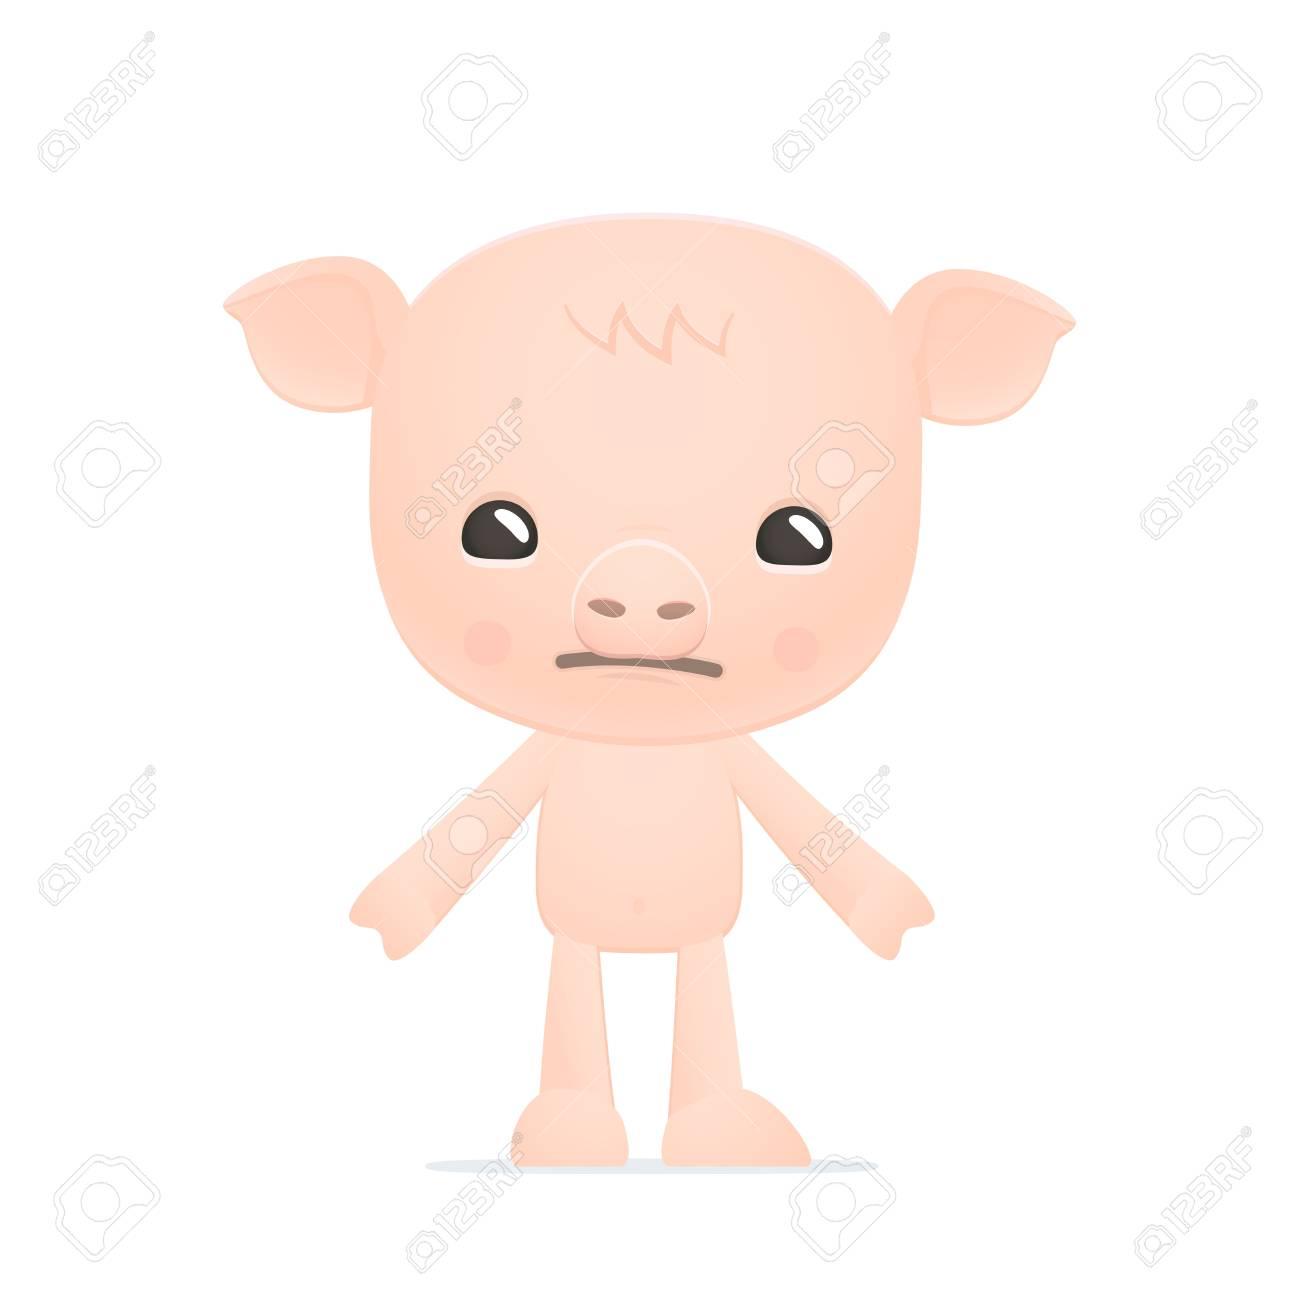 funny cartoon pig Stock Vector - 18009274